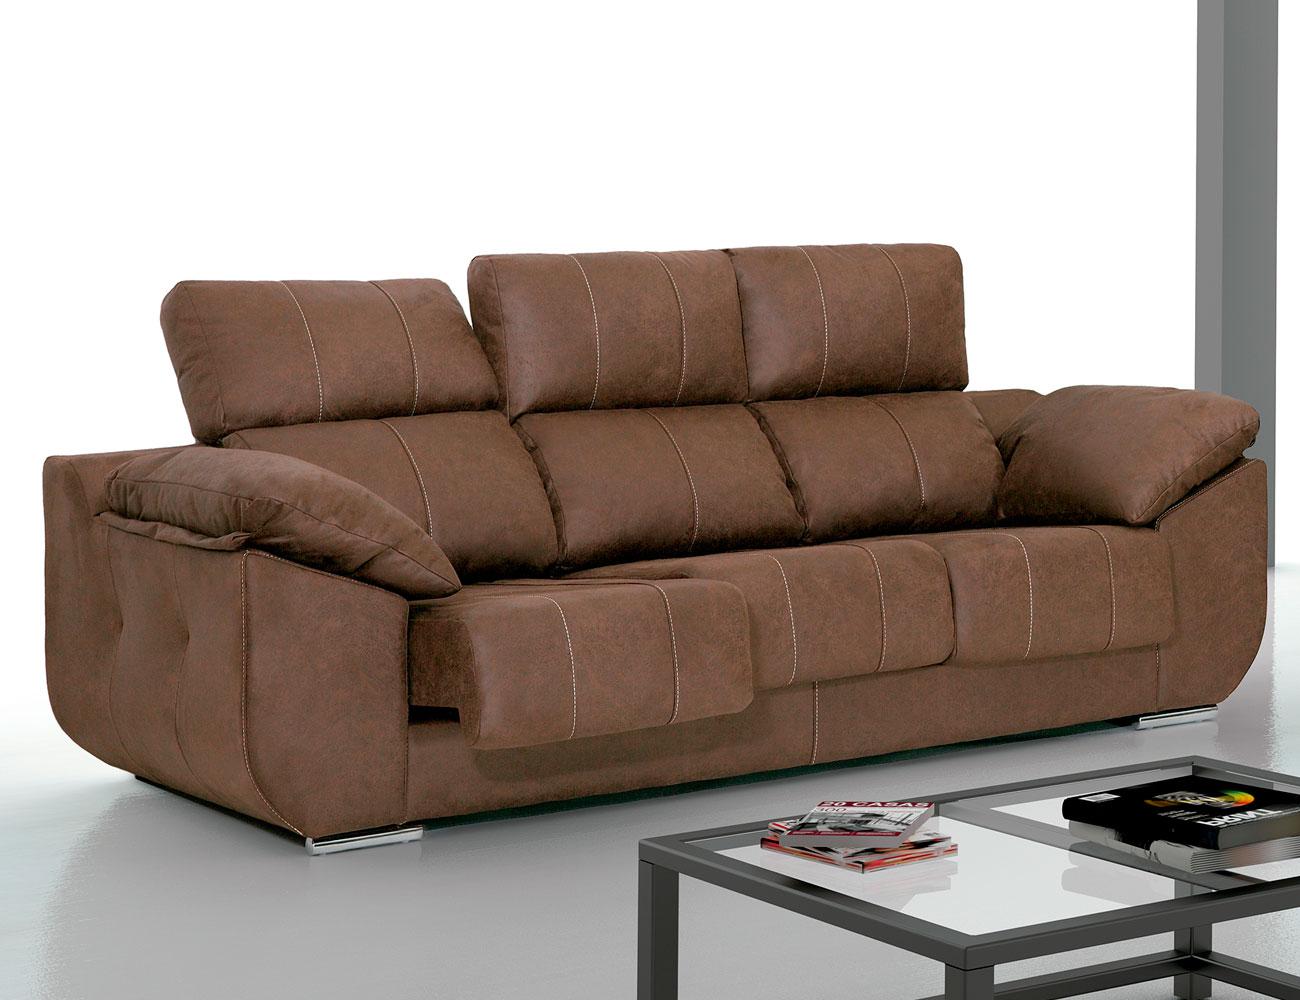 Sof con asientos extra bles y respaldos reclinables en for Sofas 4 plazas reclinables